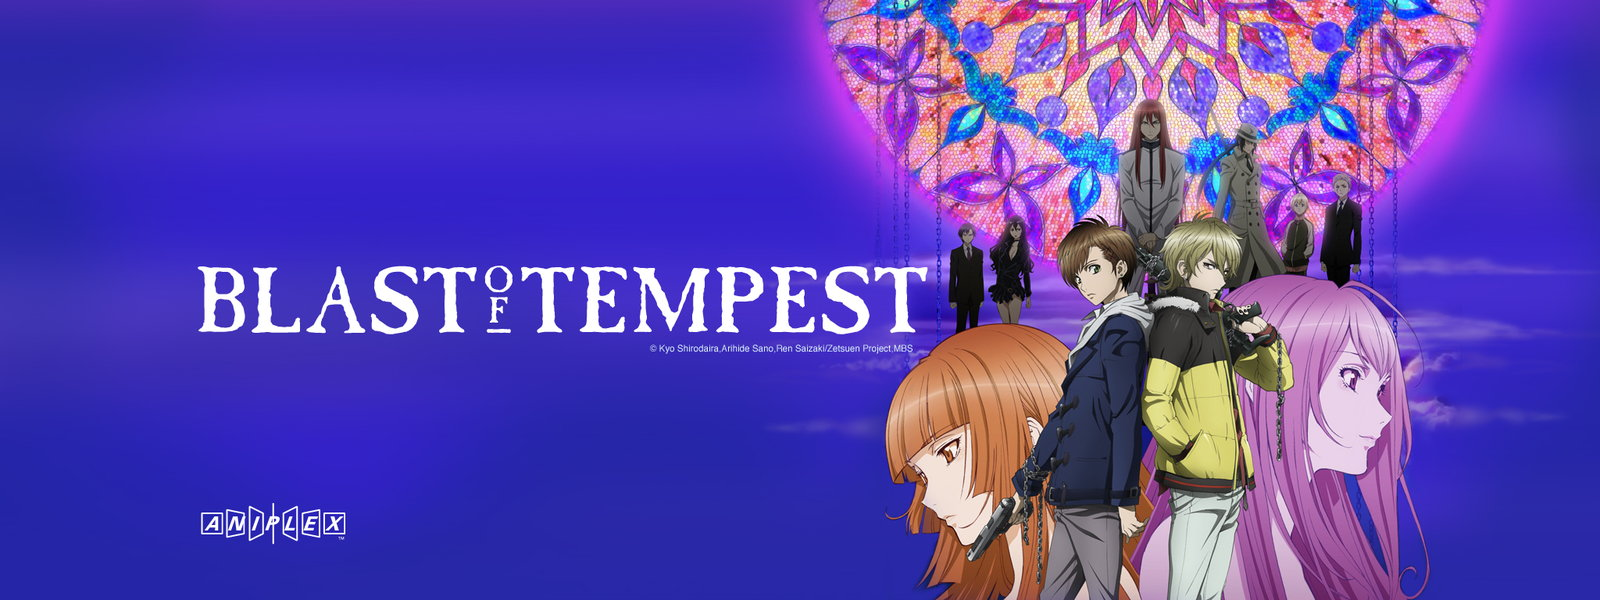 Fragglepuss Anime Review 51 Blast Of Tempest Zetsuen No